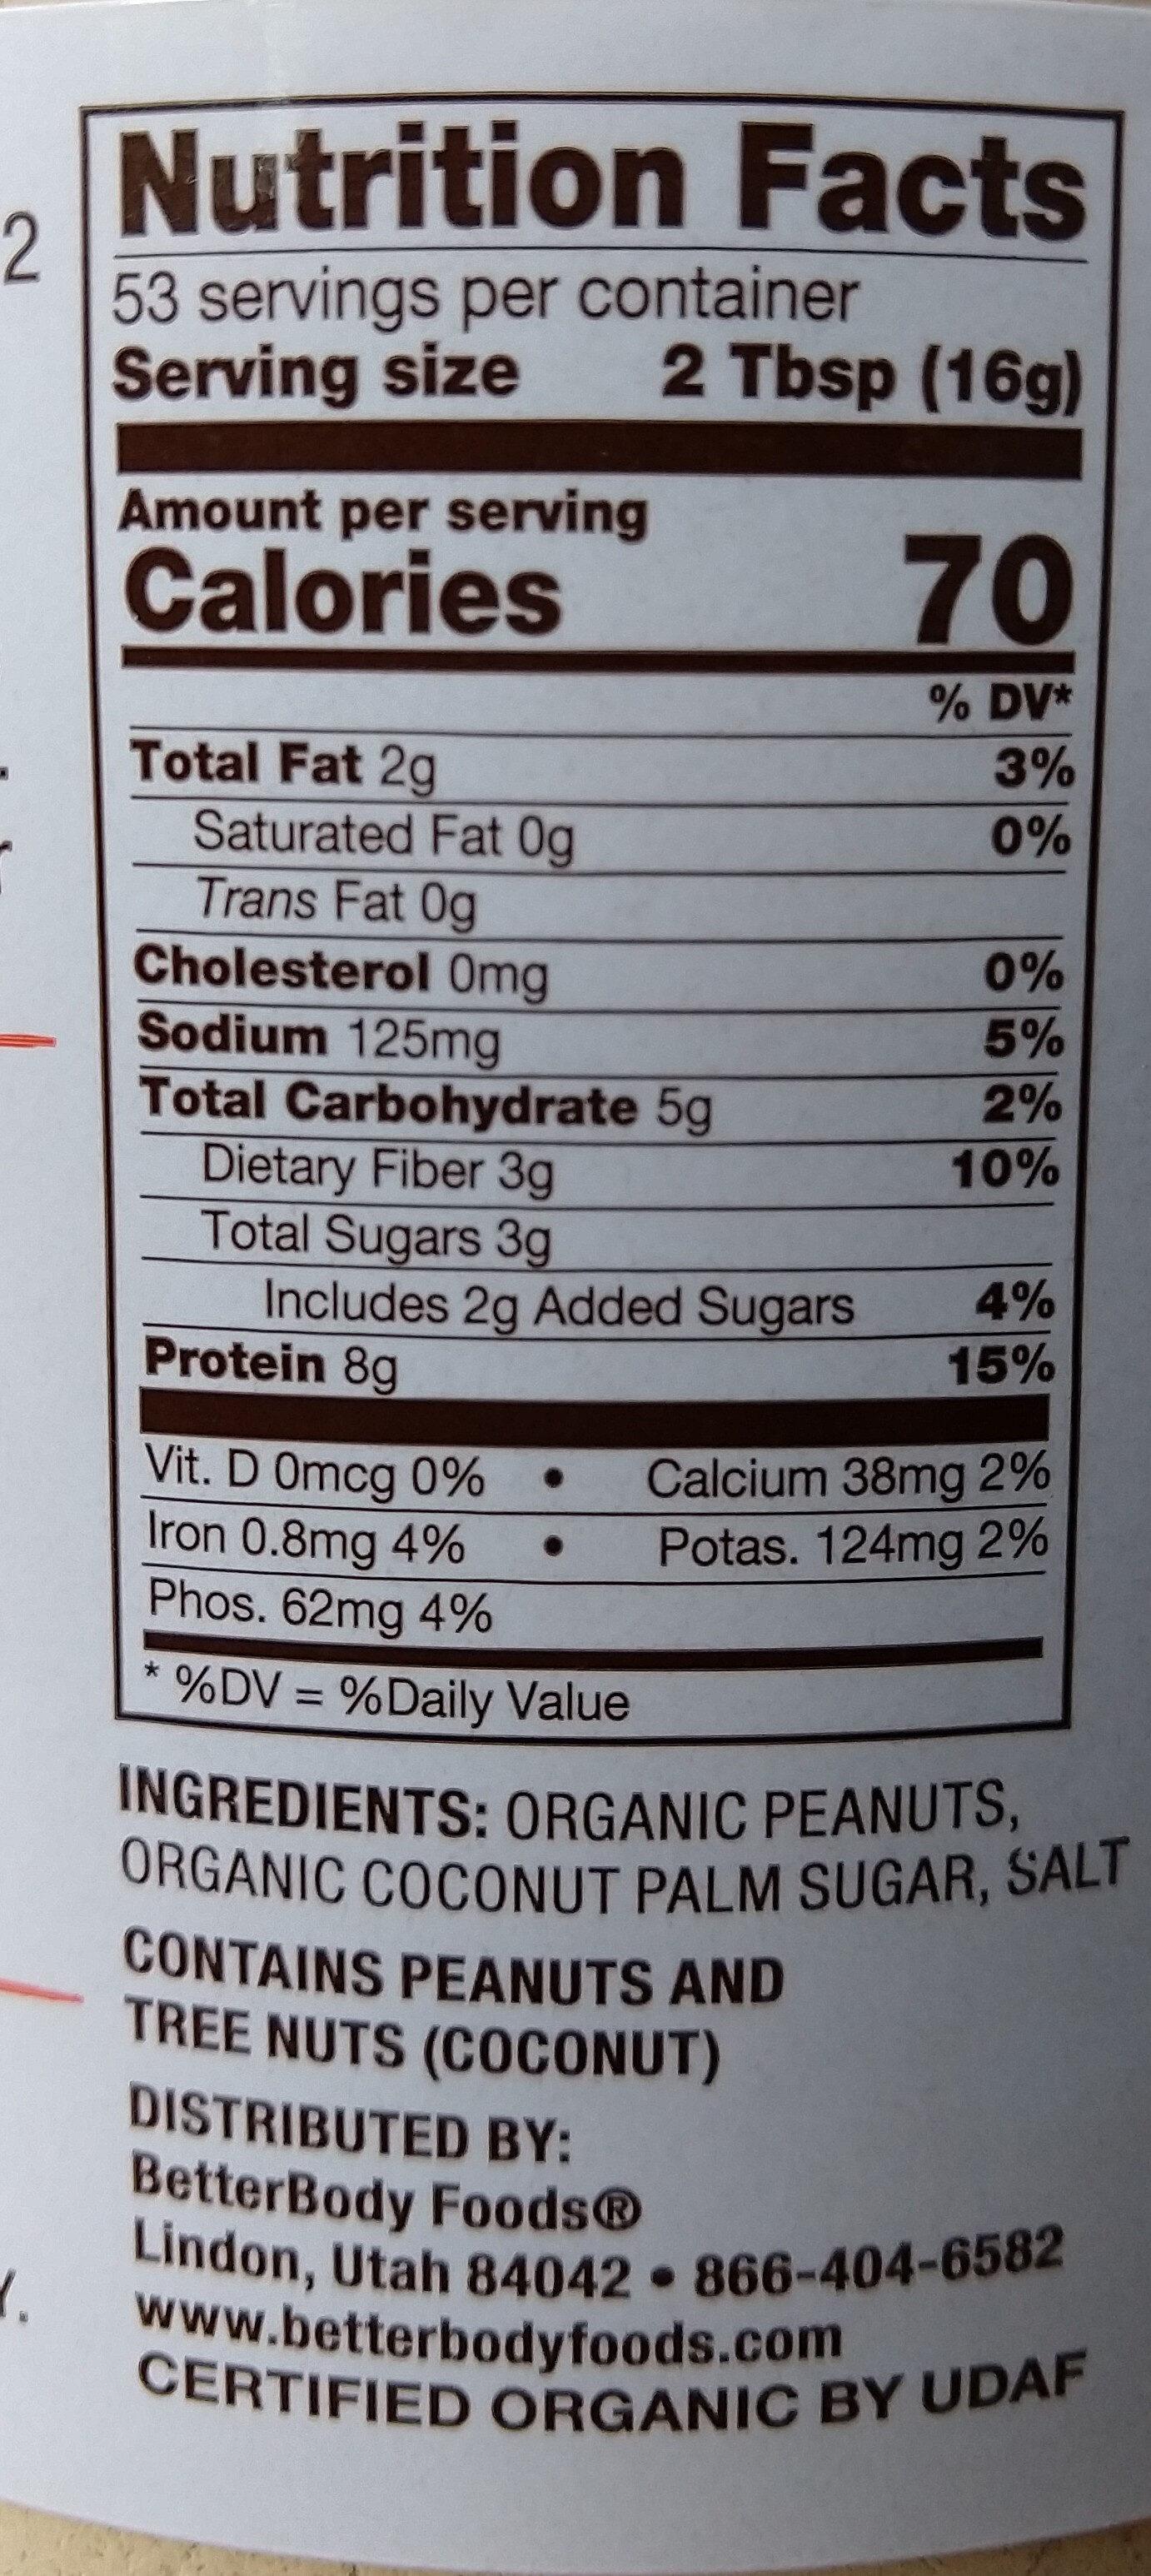 Betterbody Foods PB Fit Usda Organic Powder, Peanut Butter - Ingredients - en